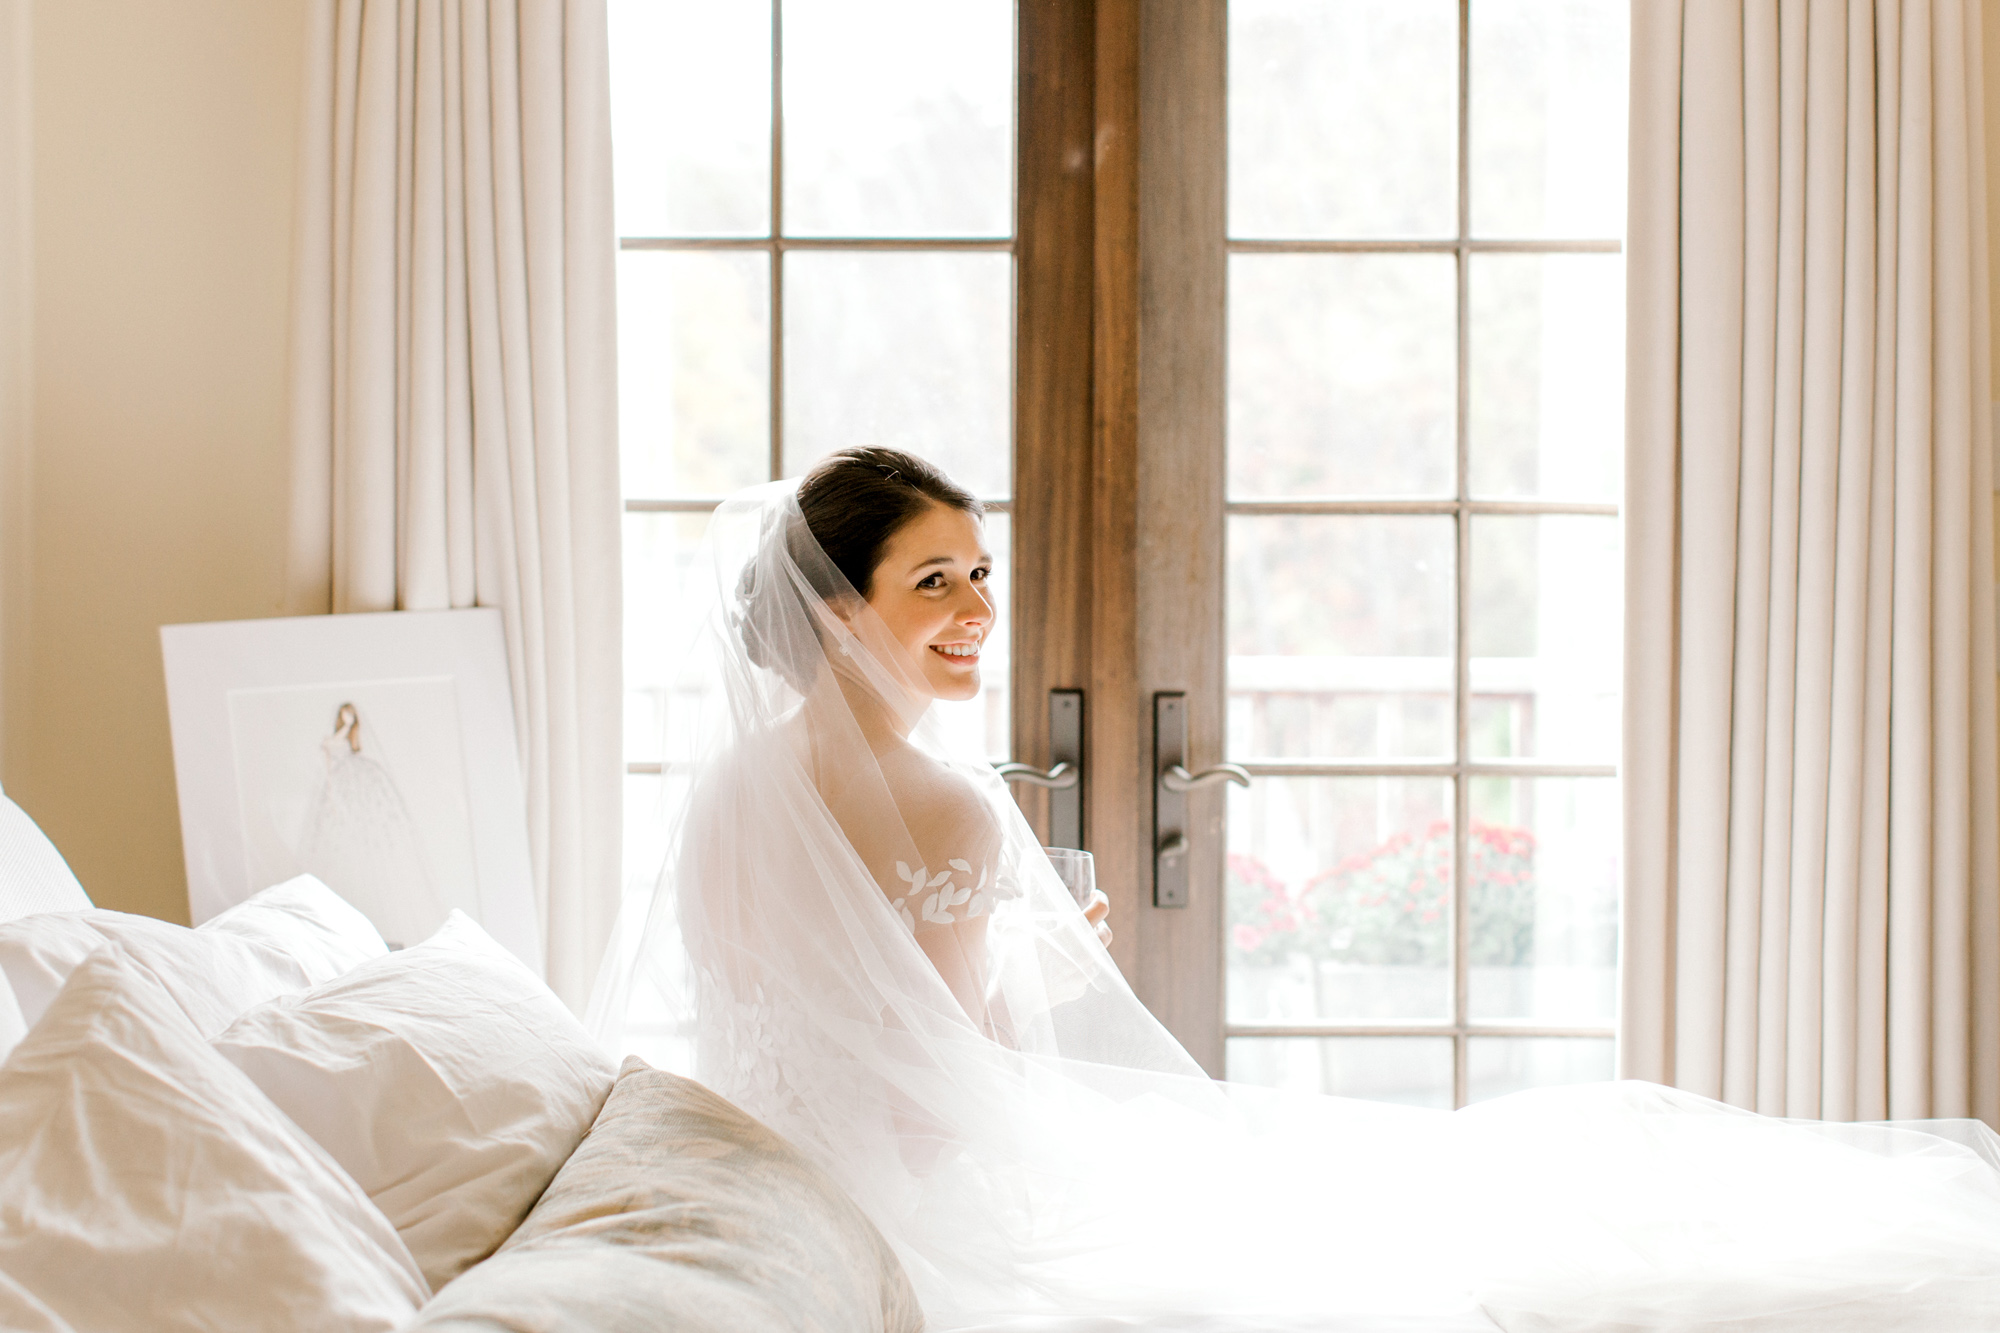 27_Bedford_Post_Inn_Wedding_Bedford_NY_Tanya_Salazar_Photography_001.jpg